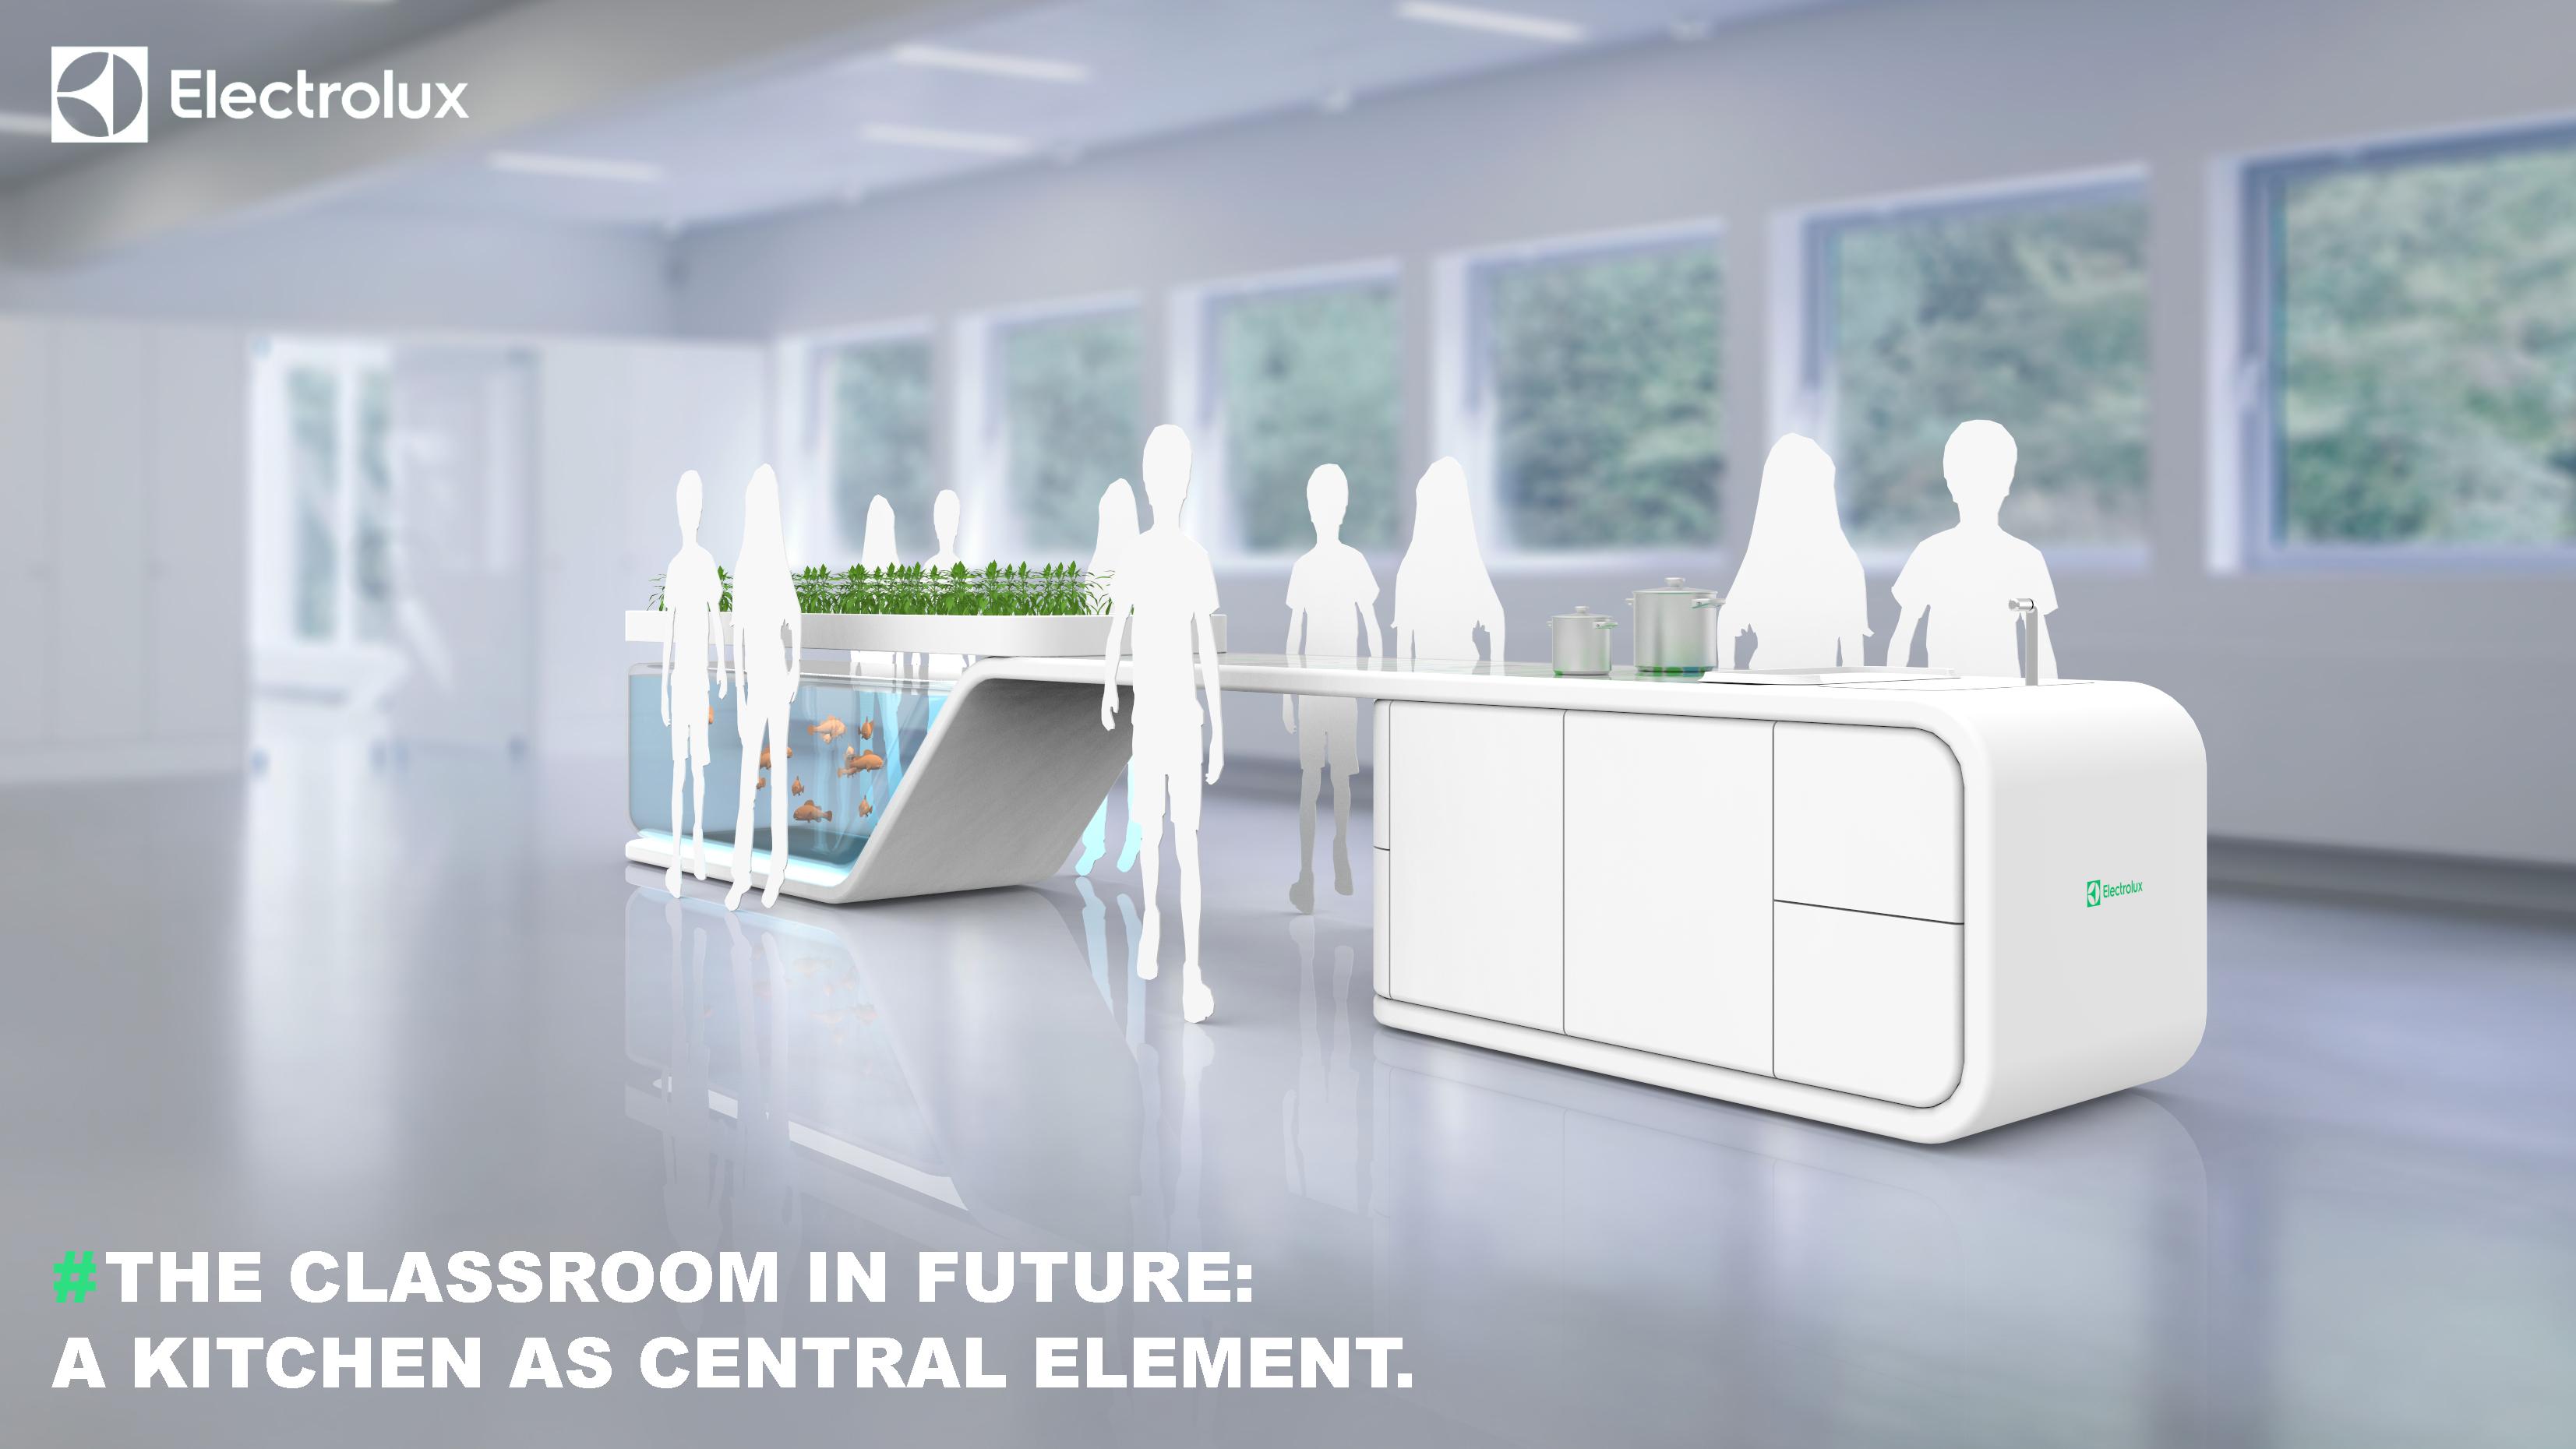 TobiasTsamisis_Classroom in future